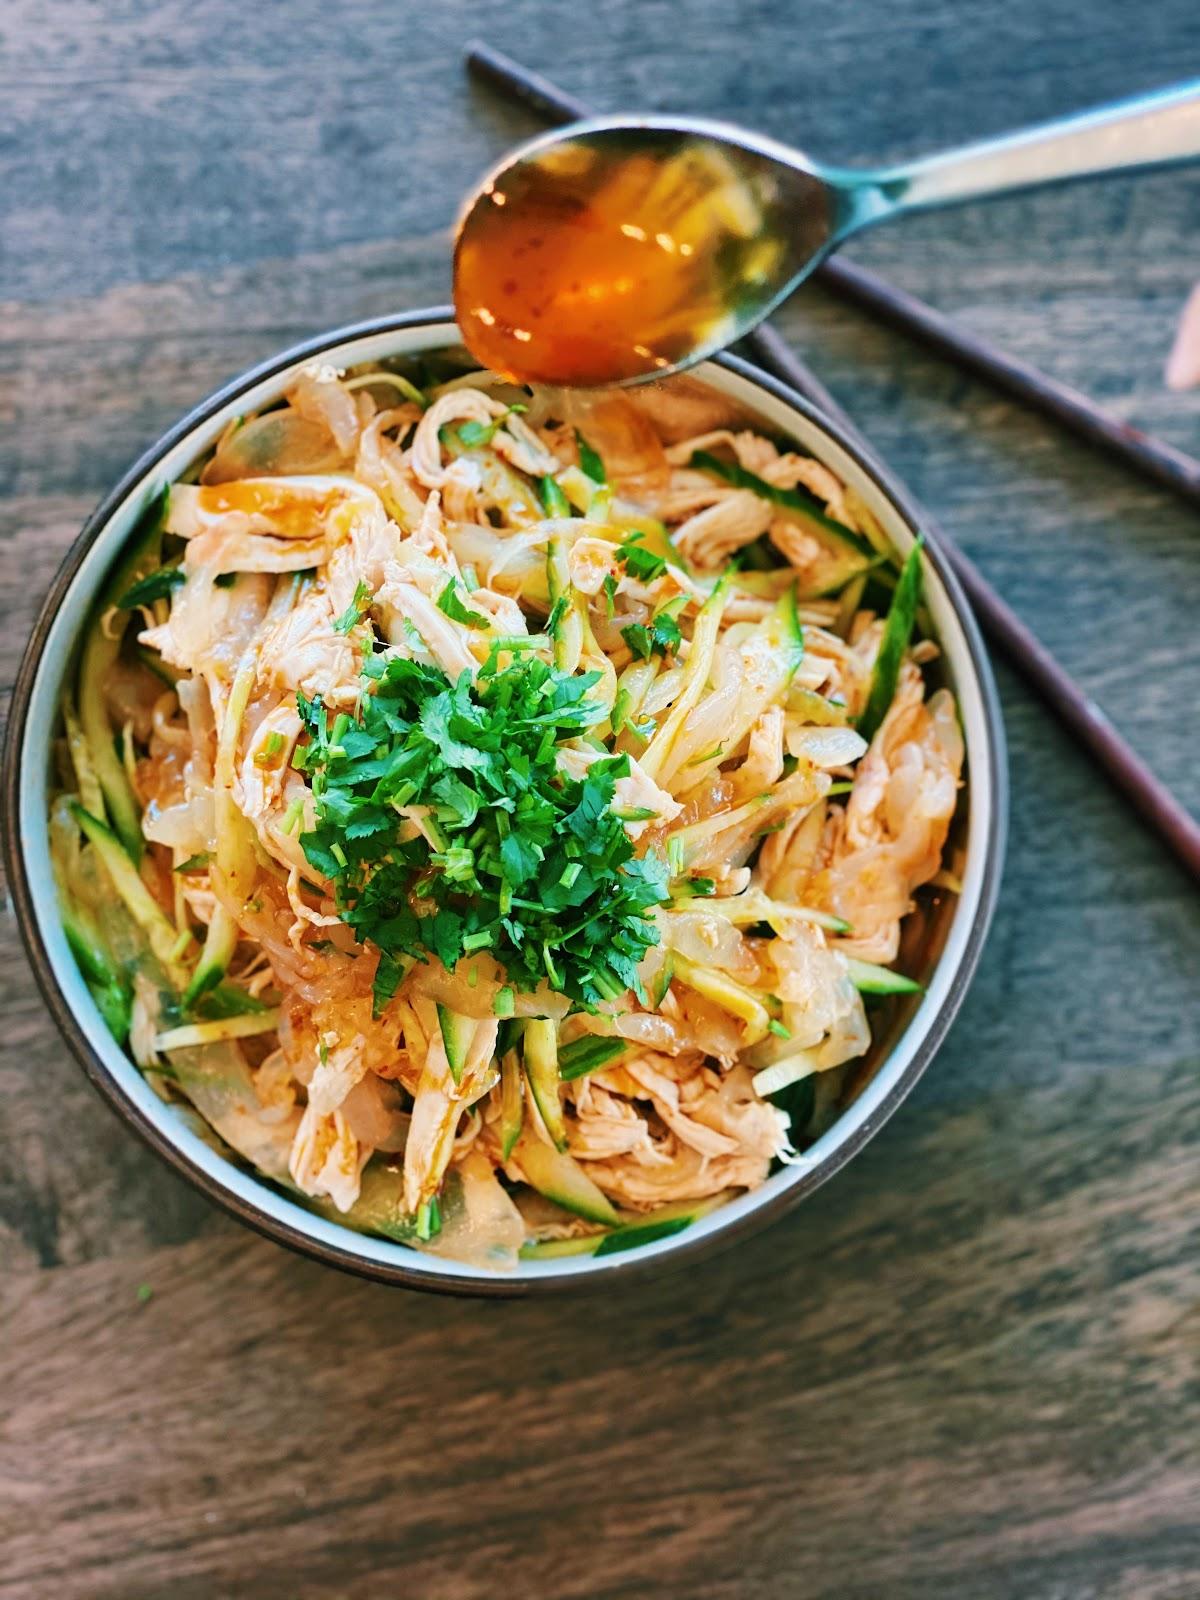 Spicy Jellyfish Salad